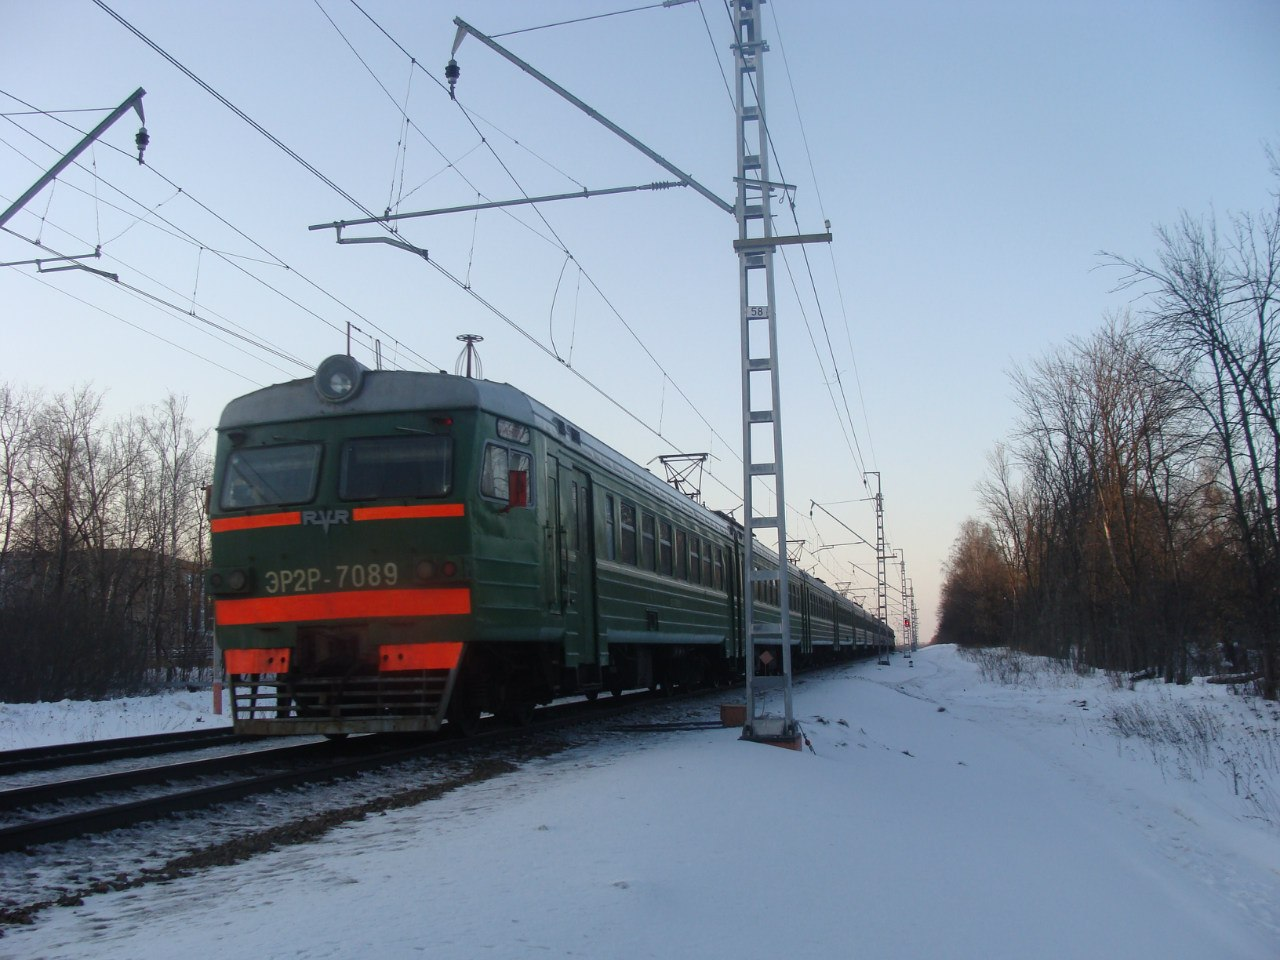 Фотографии подвижного состава - Страница 2 Z_1ea7cf2a